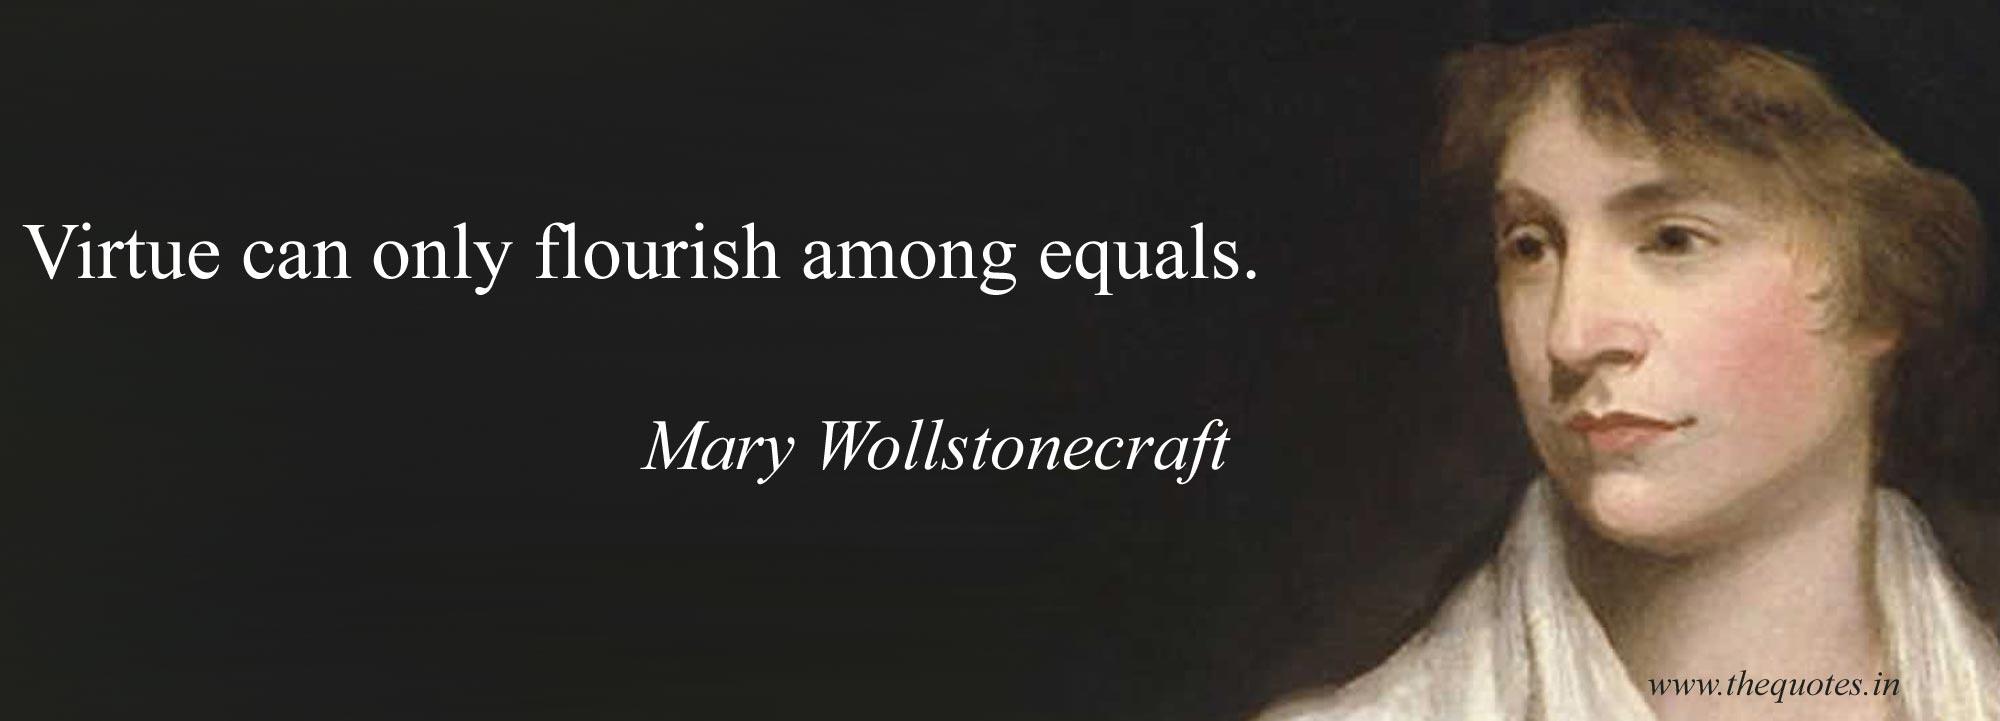 Mary-Wollstonecraft-Quotes-